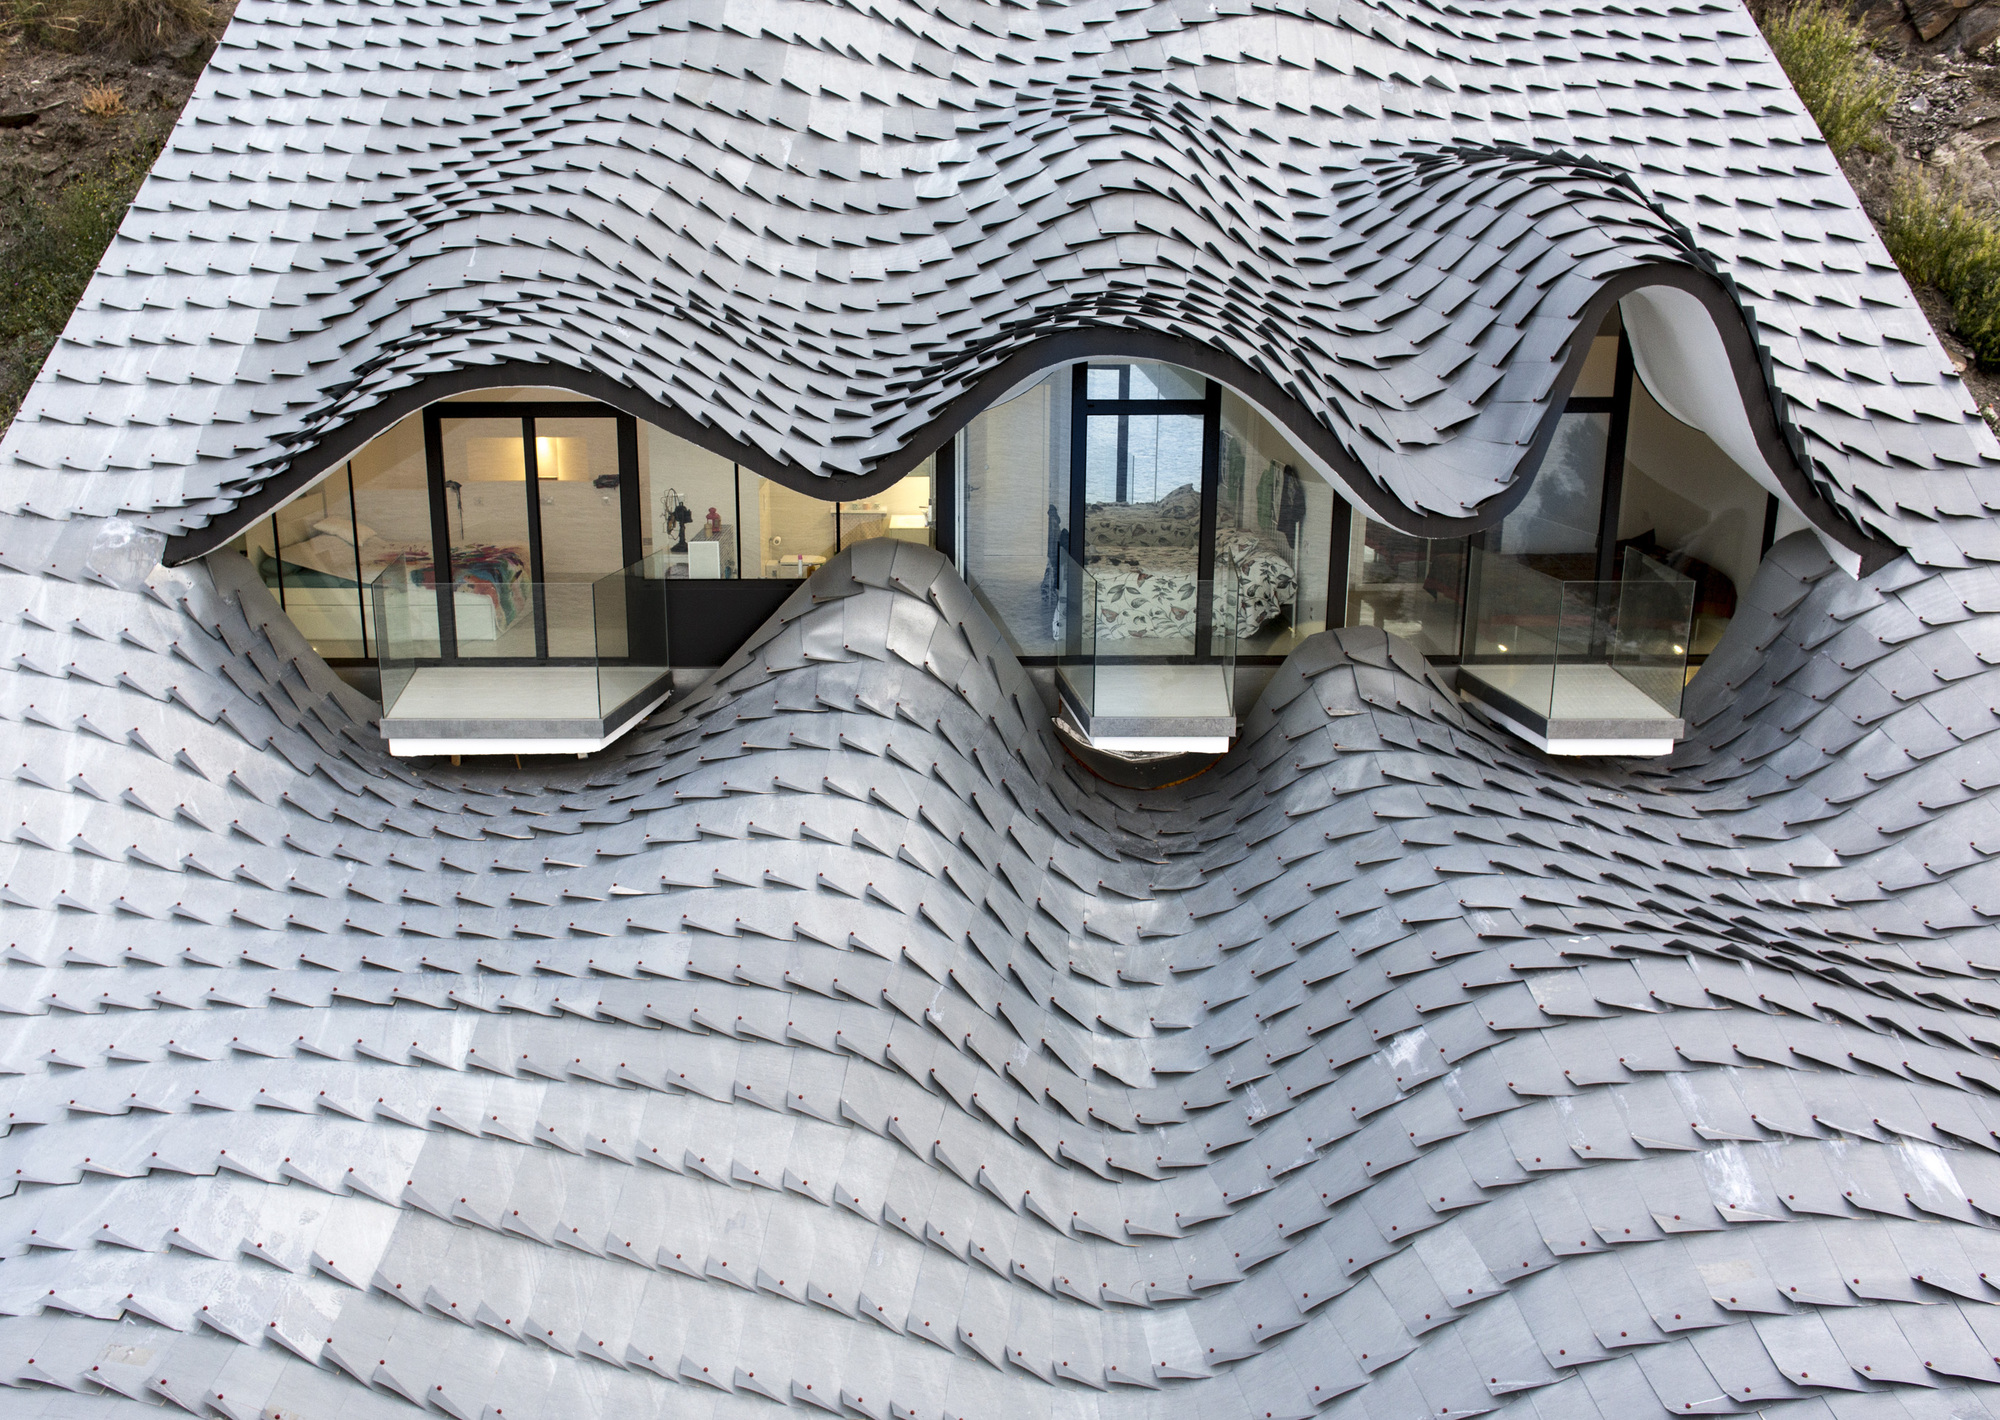 Casa del Acantilado Mirrors The Waves Of The Mediterranean Sea picture